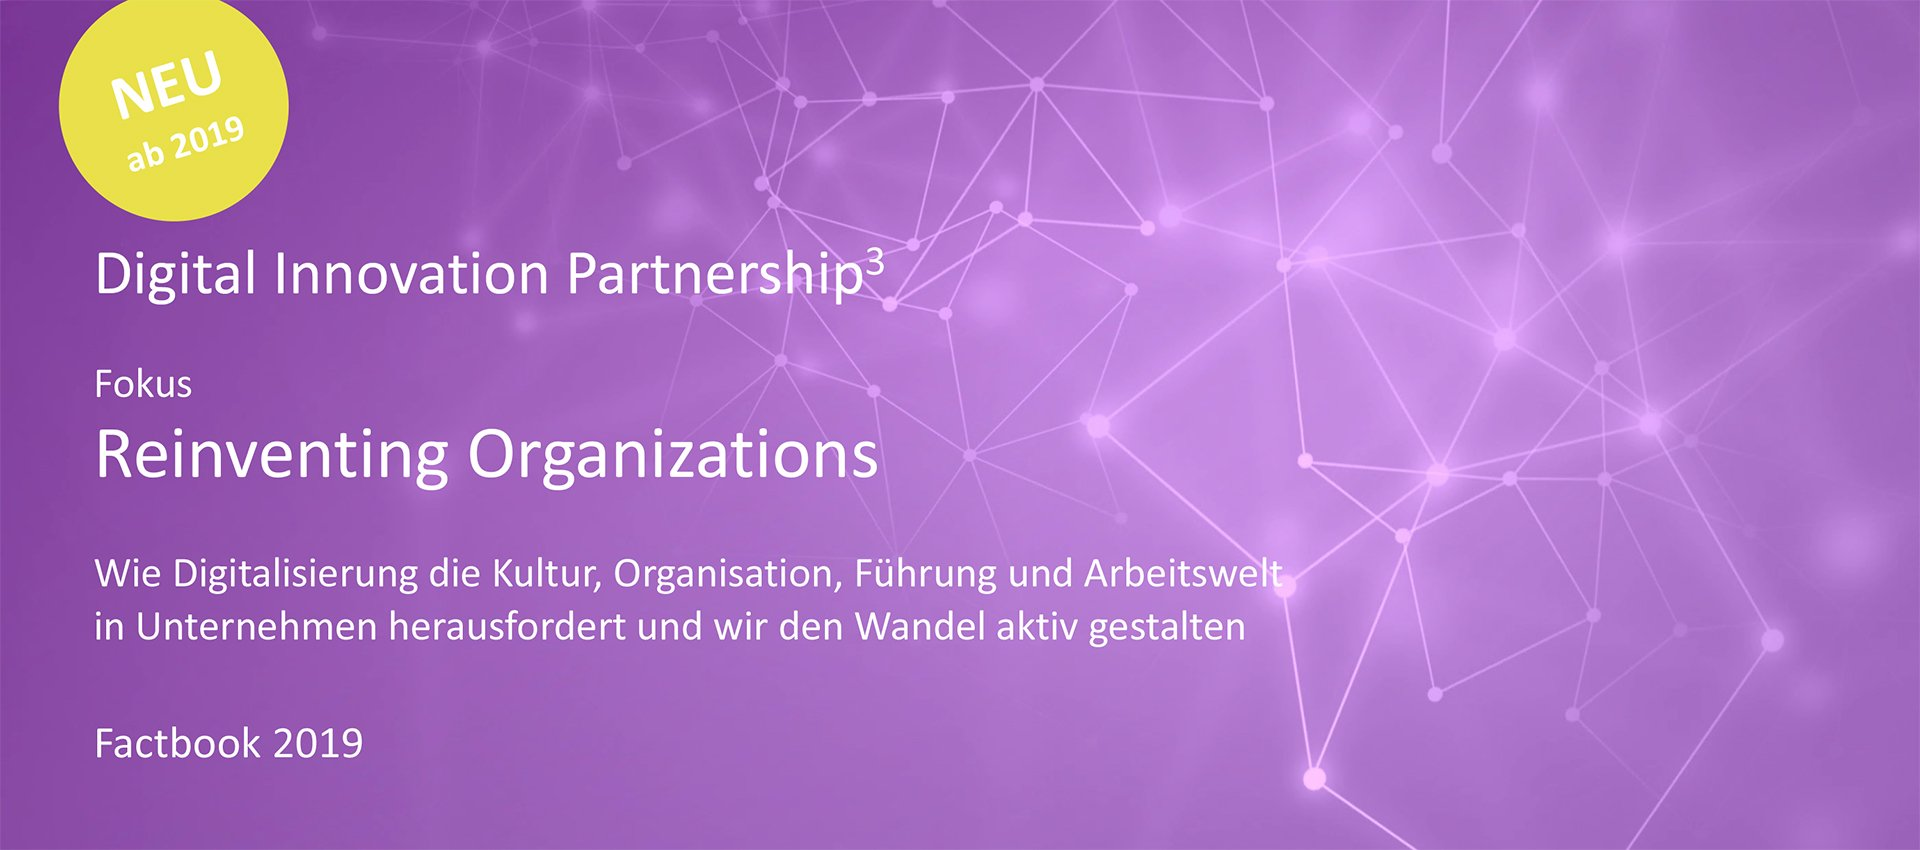 DIP3 Reinventing Organizations